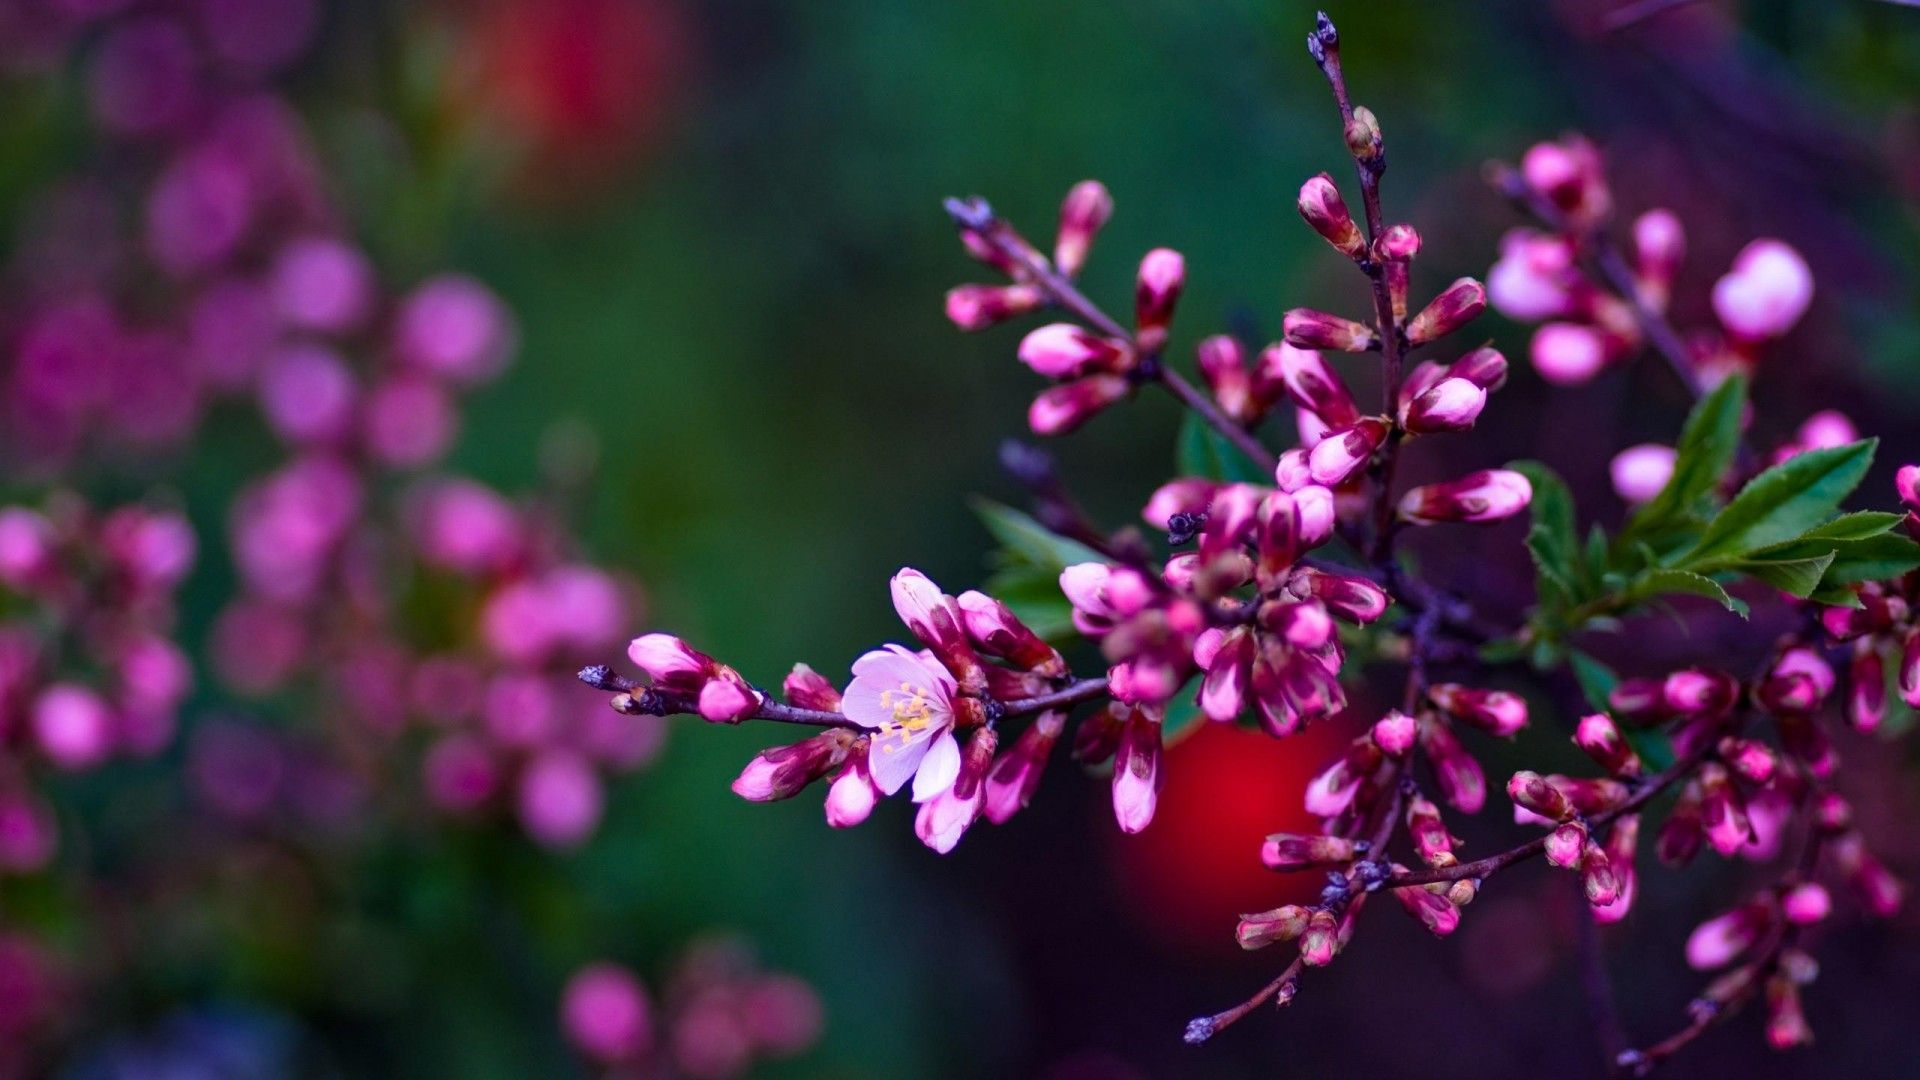 Spring Desktop Wallpapers HD PixelsTalk Spring Flowers Live 1920x1080